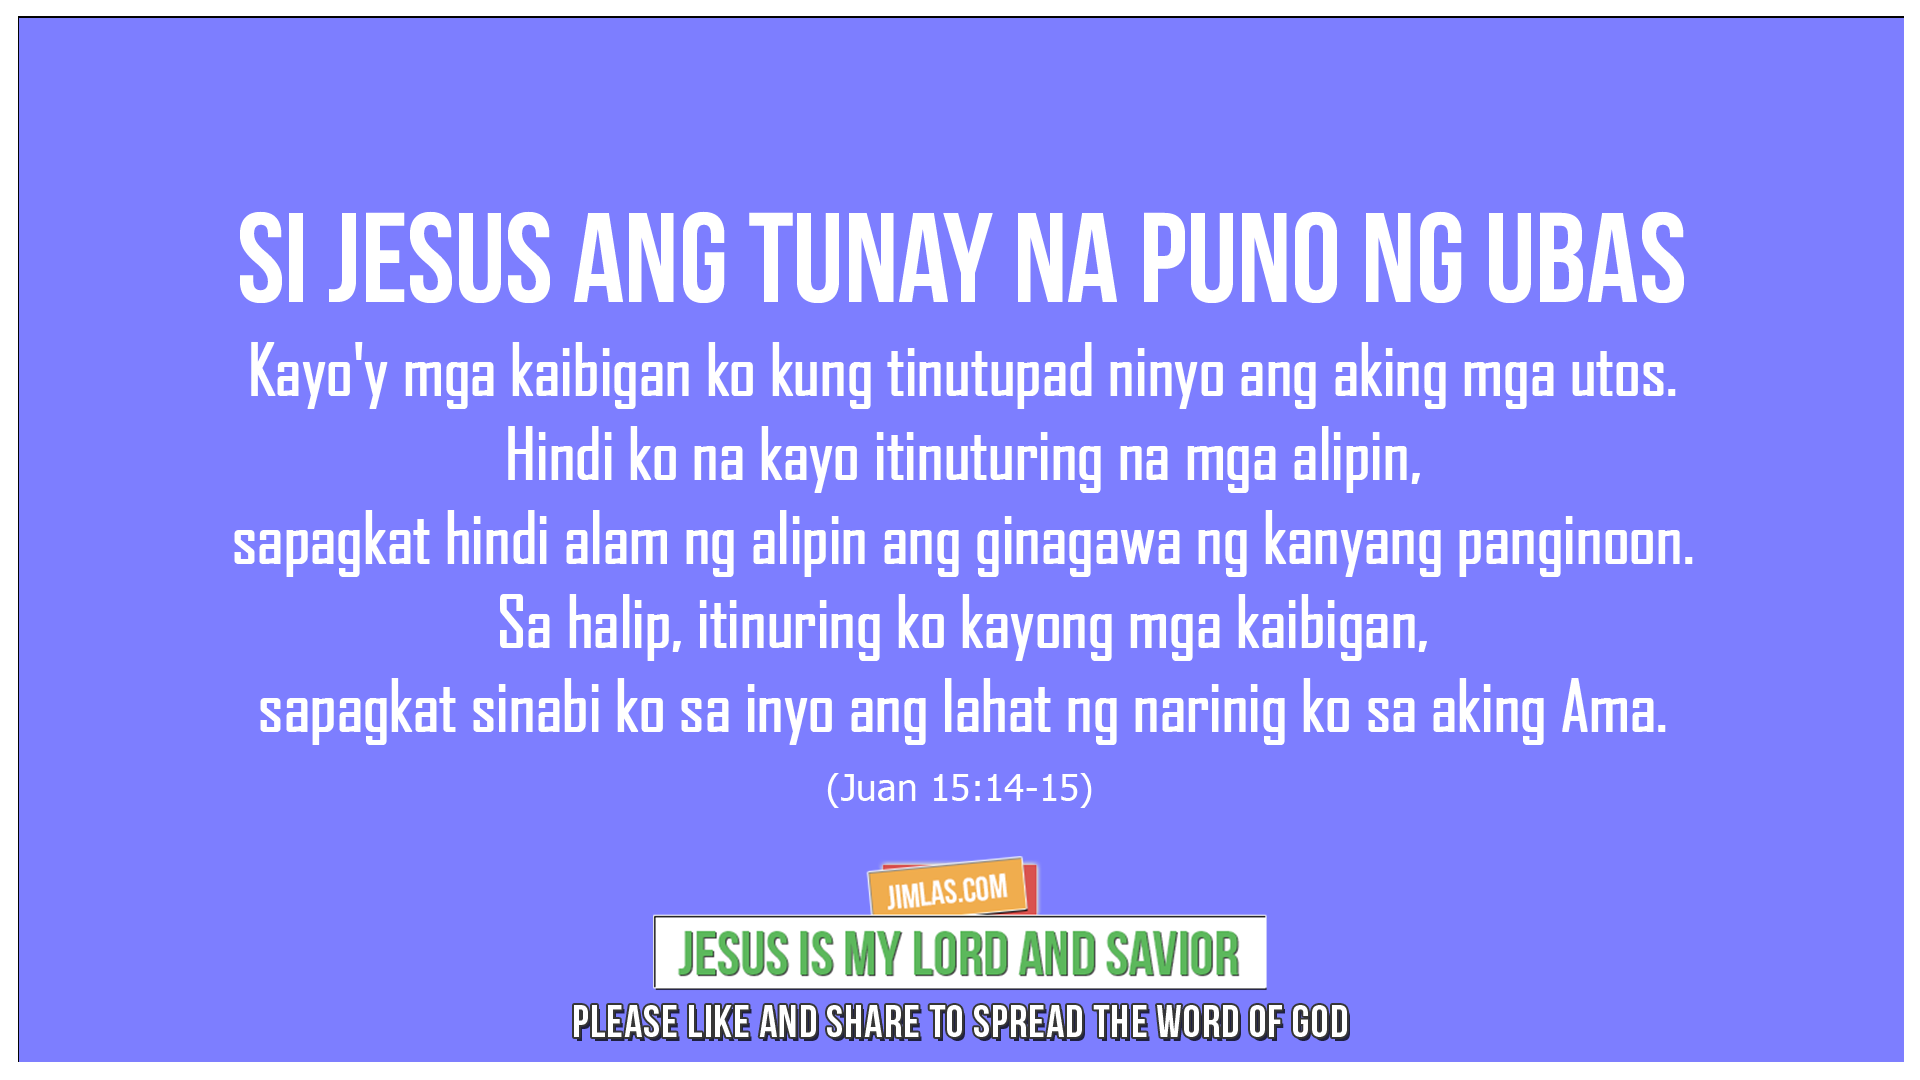 Juan 15 14-15, Juan 15:14-15